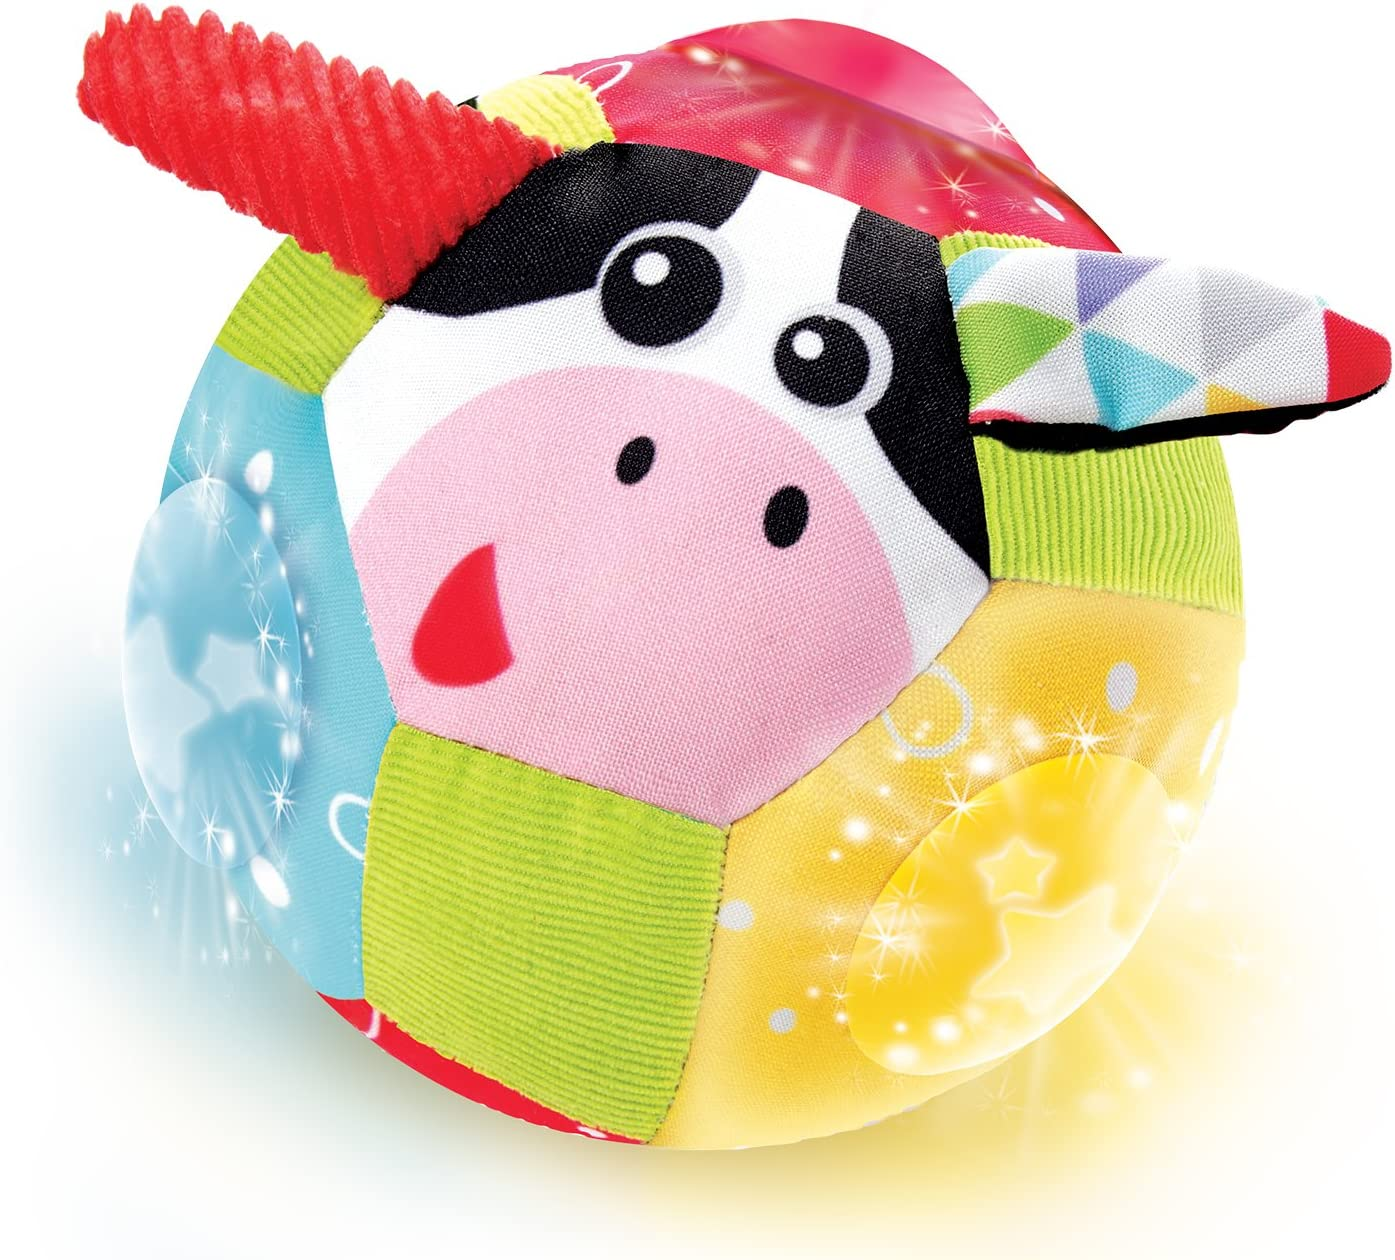 YOOKIDOO 40146 Ballon damis avec lumi/ère et Musique Multicolore